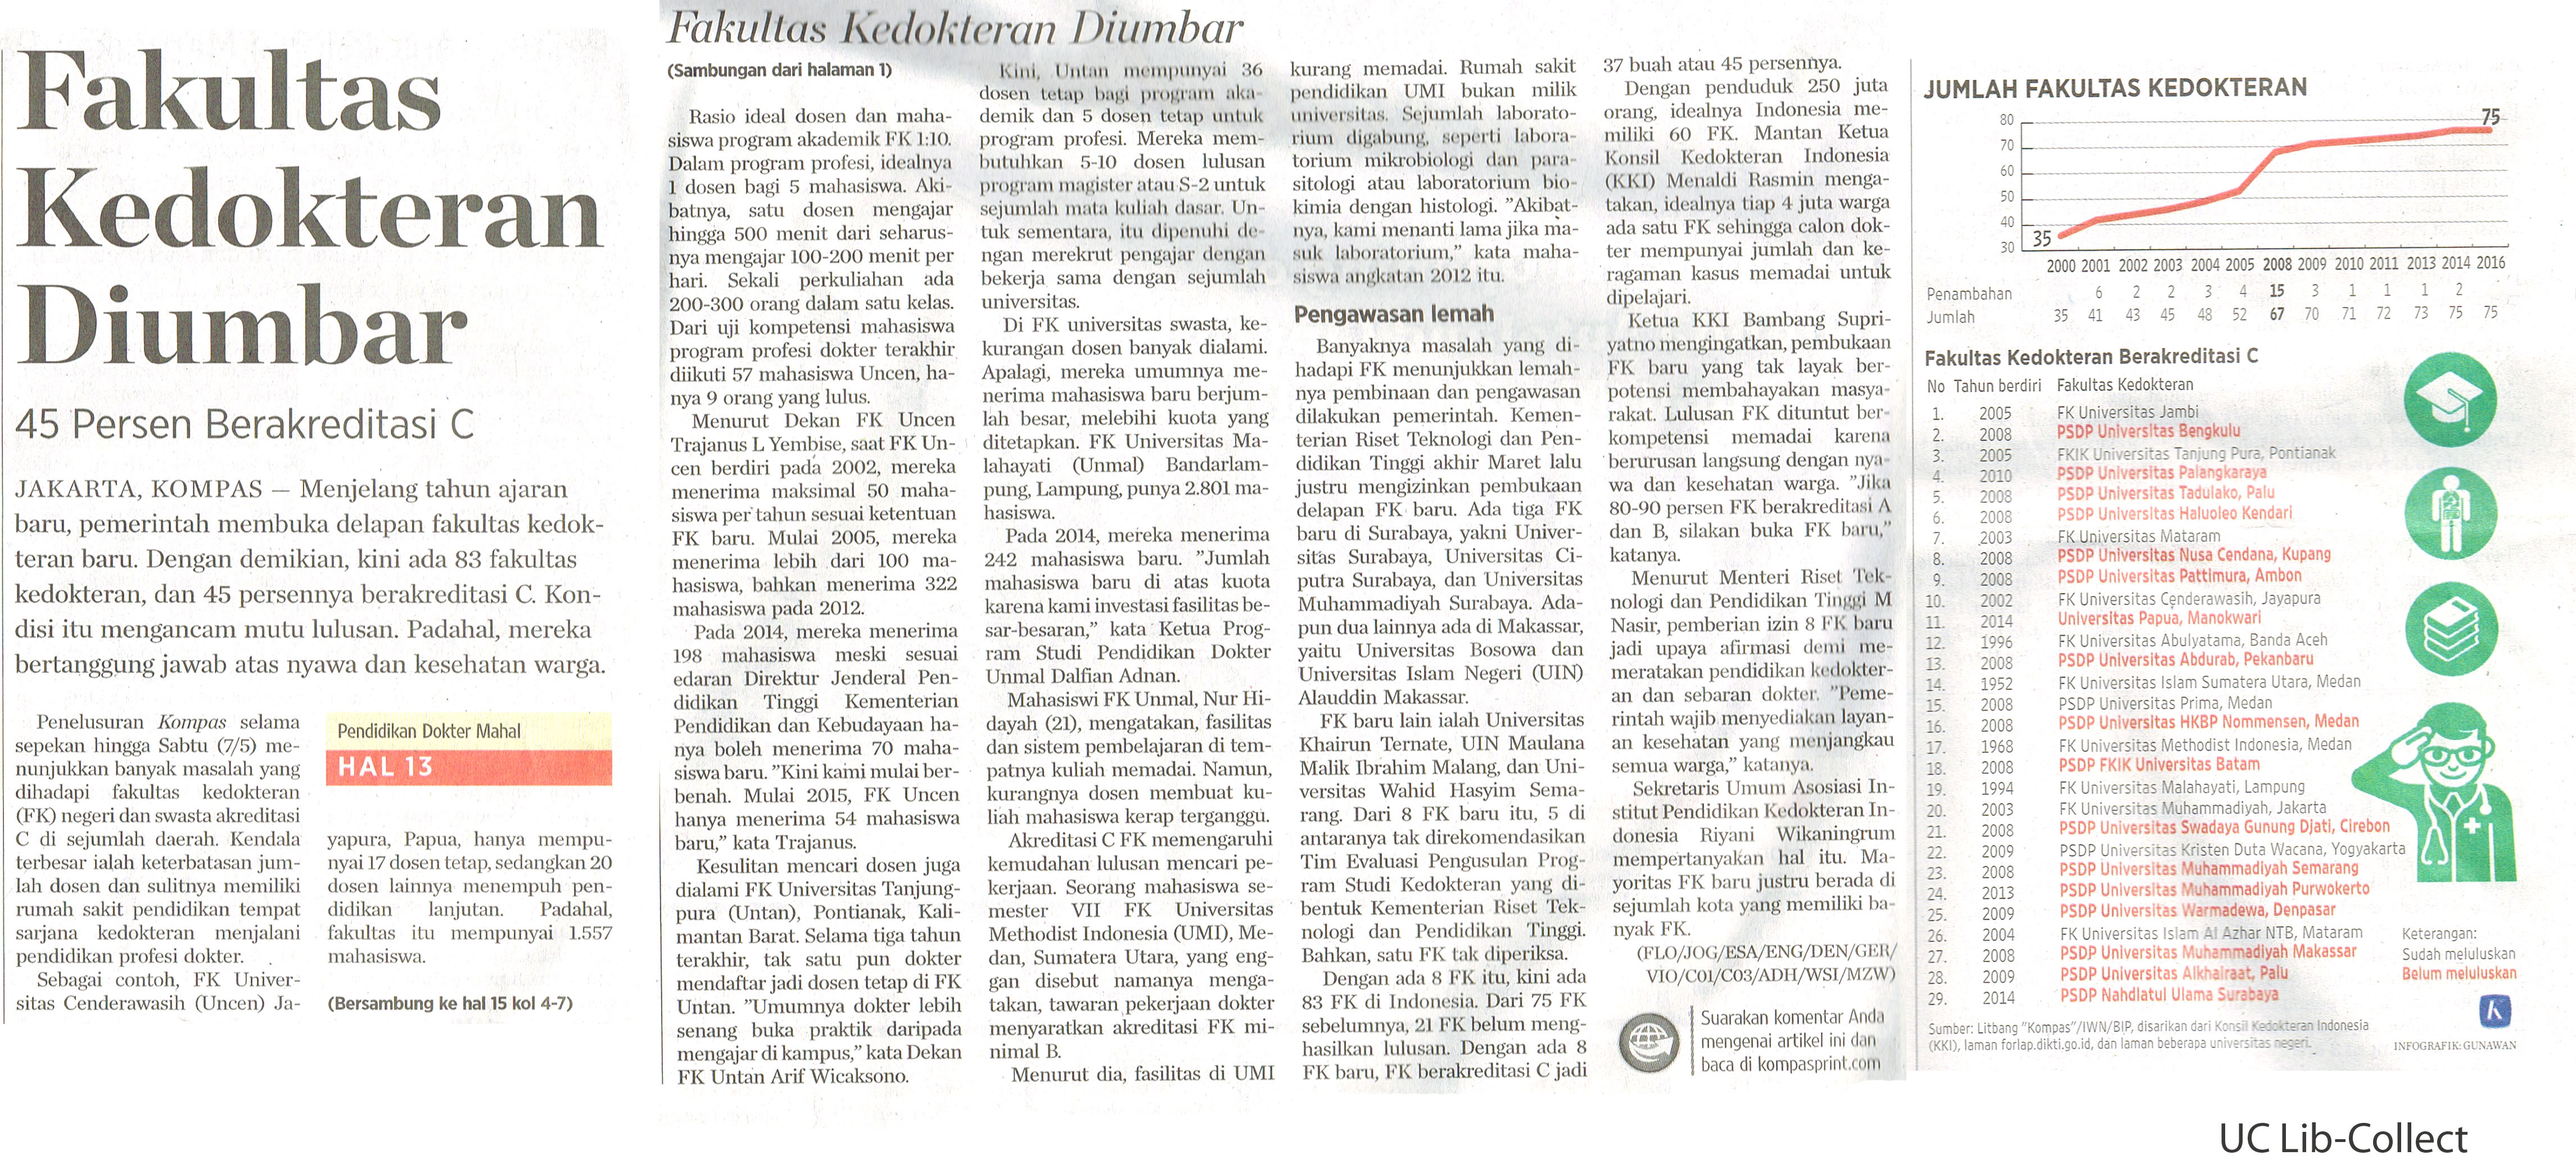 Fakultas Kedokteran Diumbar. Kompas. 9 Mei 2016.Hal.1,15